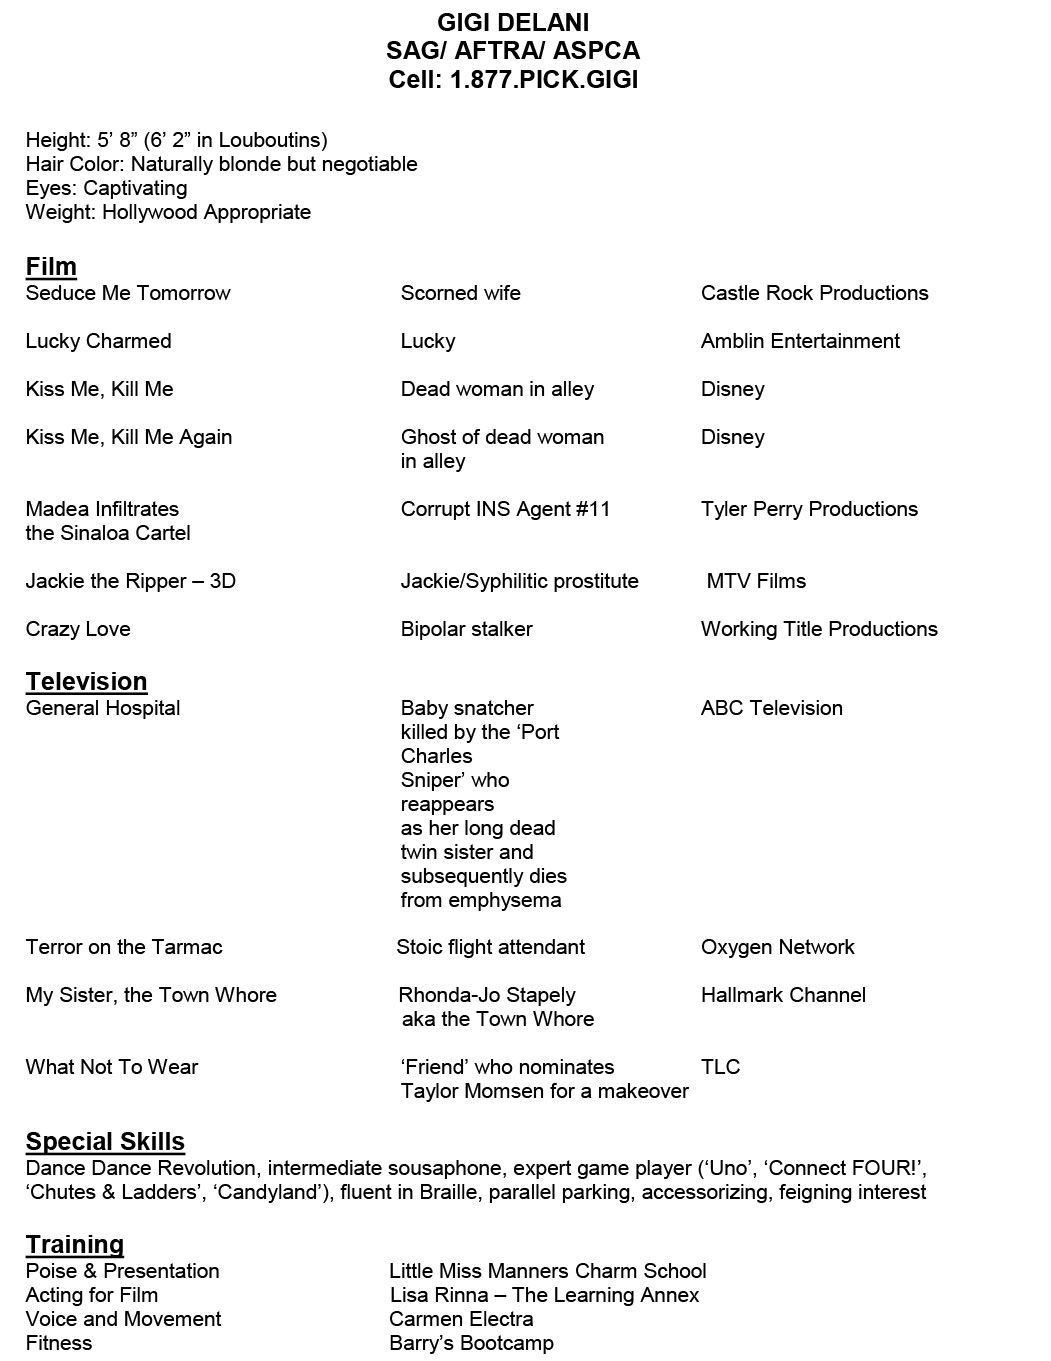 28 Resume Format 19r01 Spectacular Inspiration 300